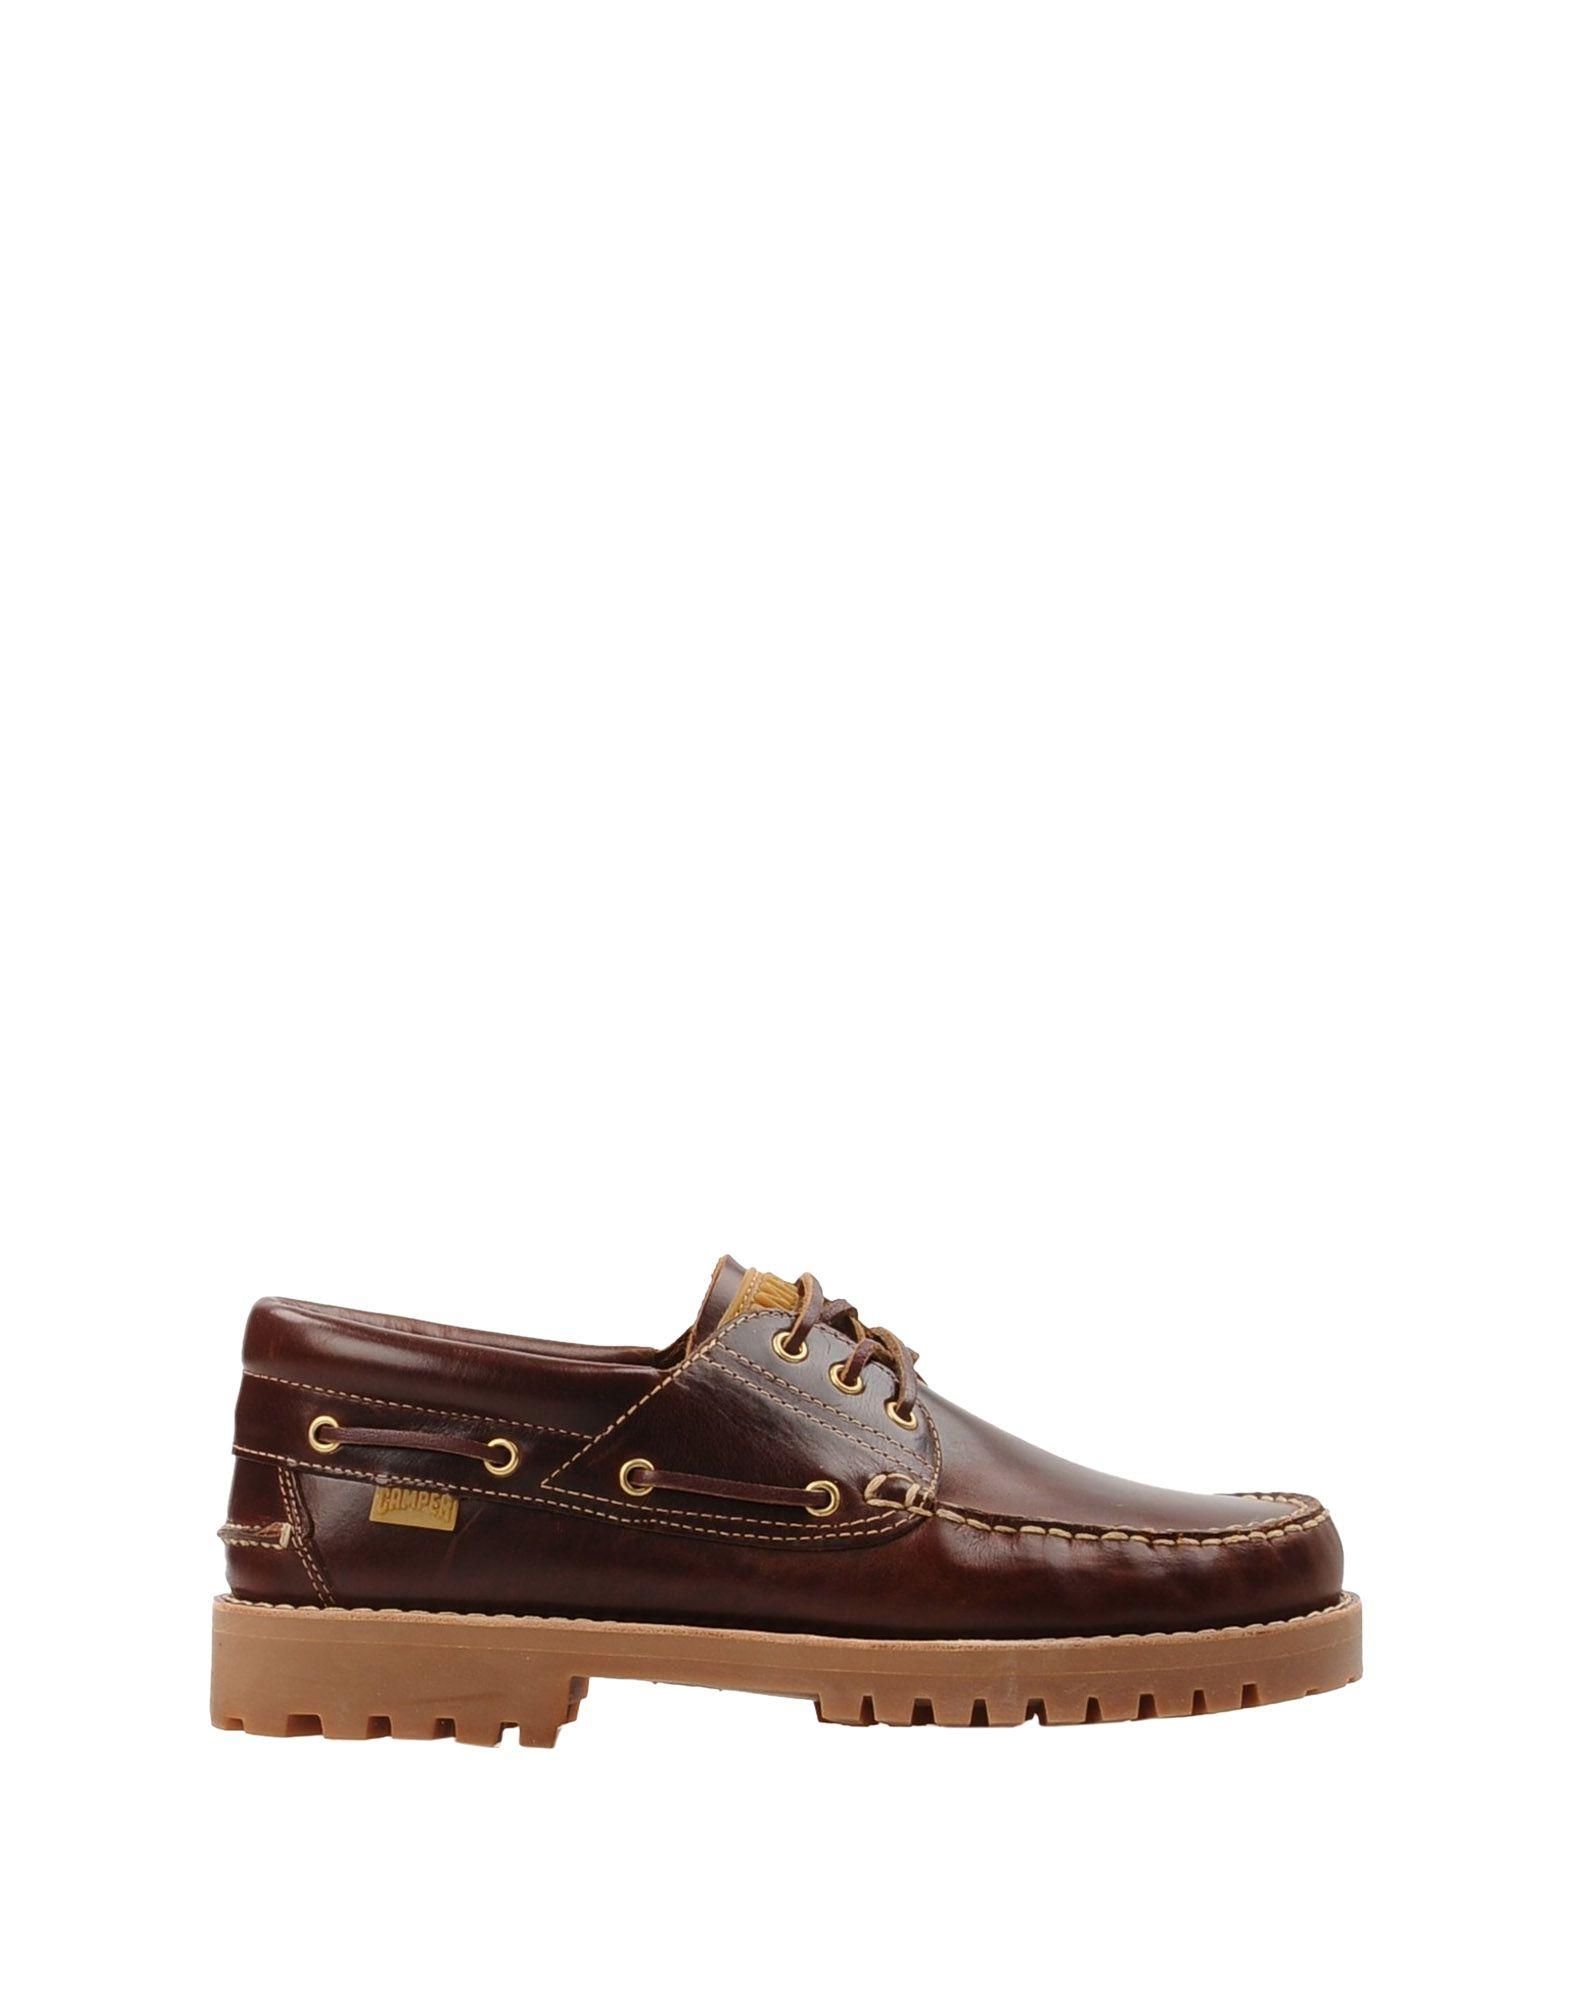 Chaussures À Lacets Camper Nautico - Homme - Chaussures À Lacets Camper sur